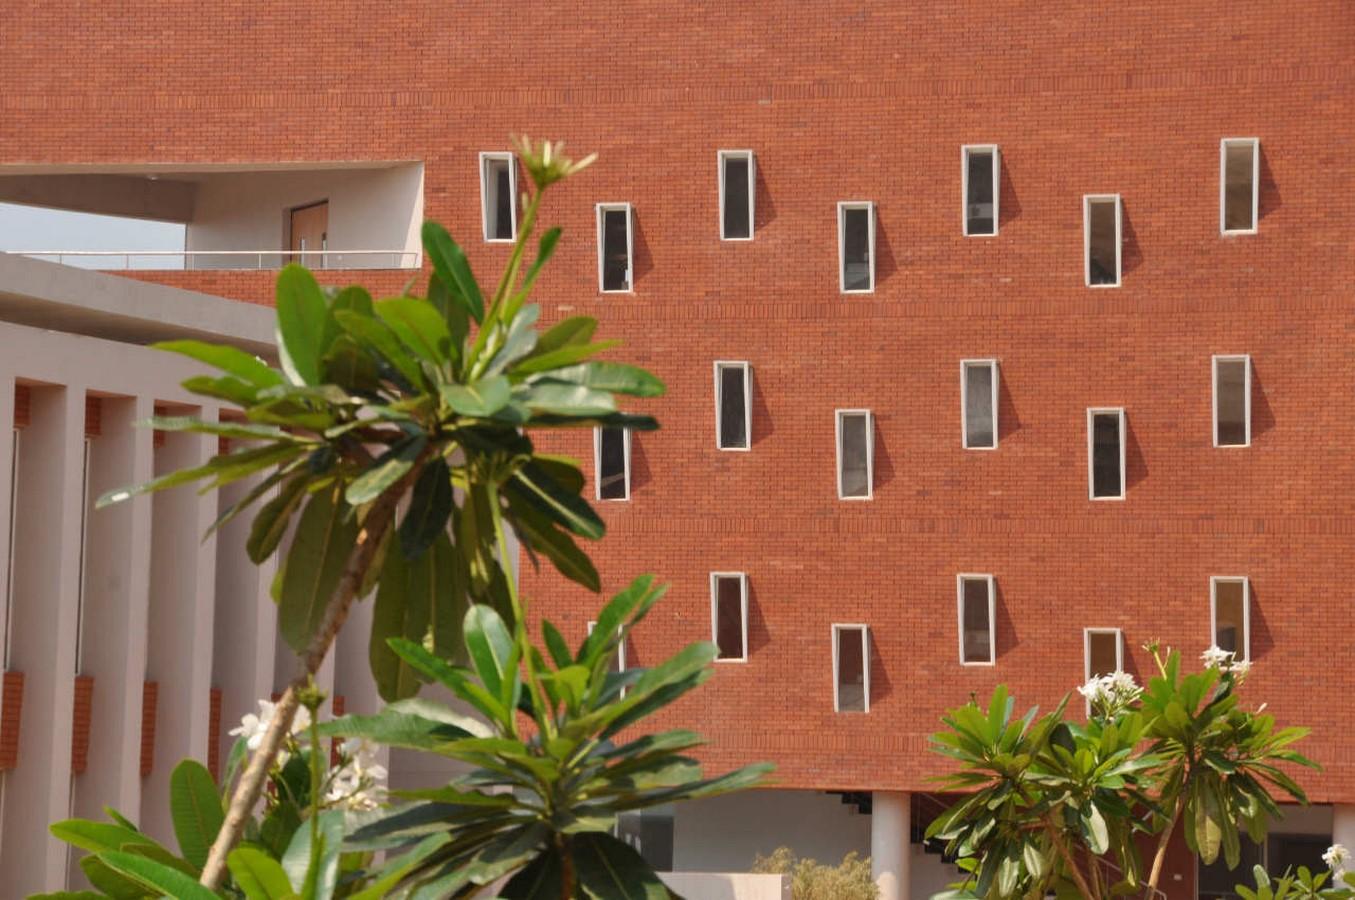 International Management Institute, Bhubaneshwar, Orissa - Sheet5